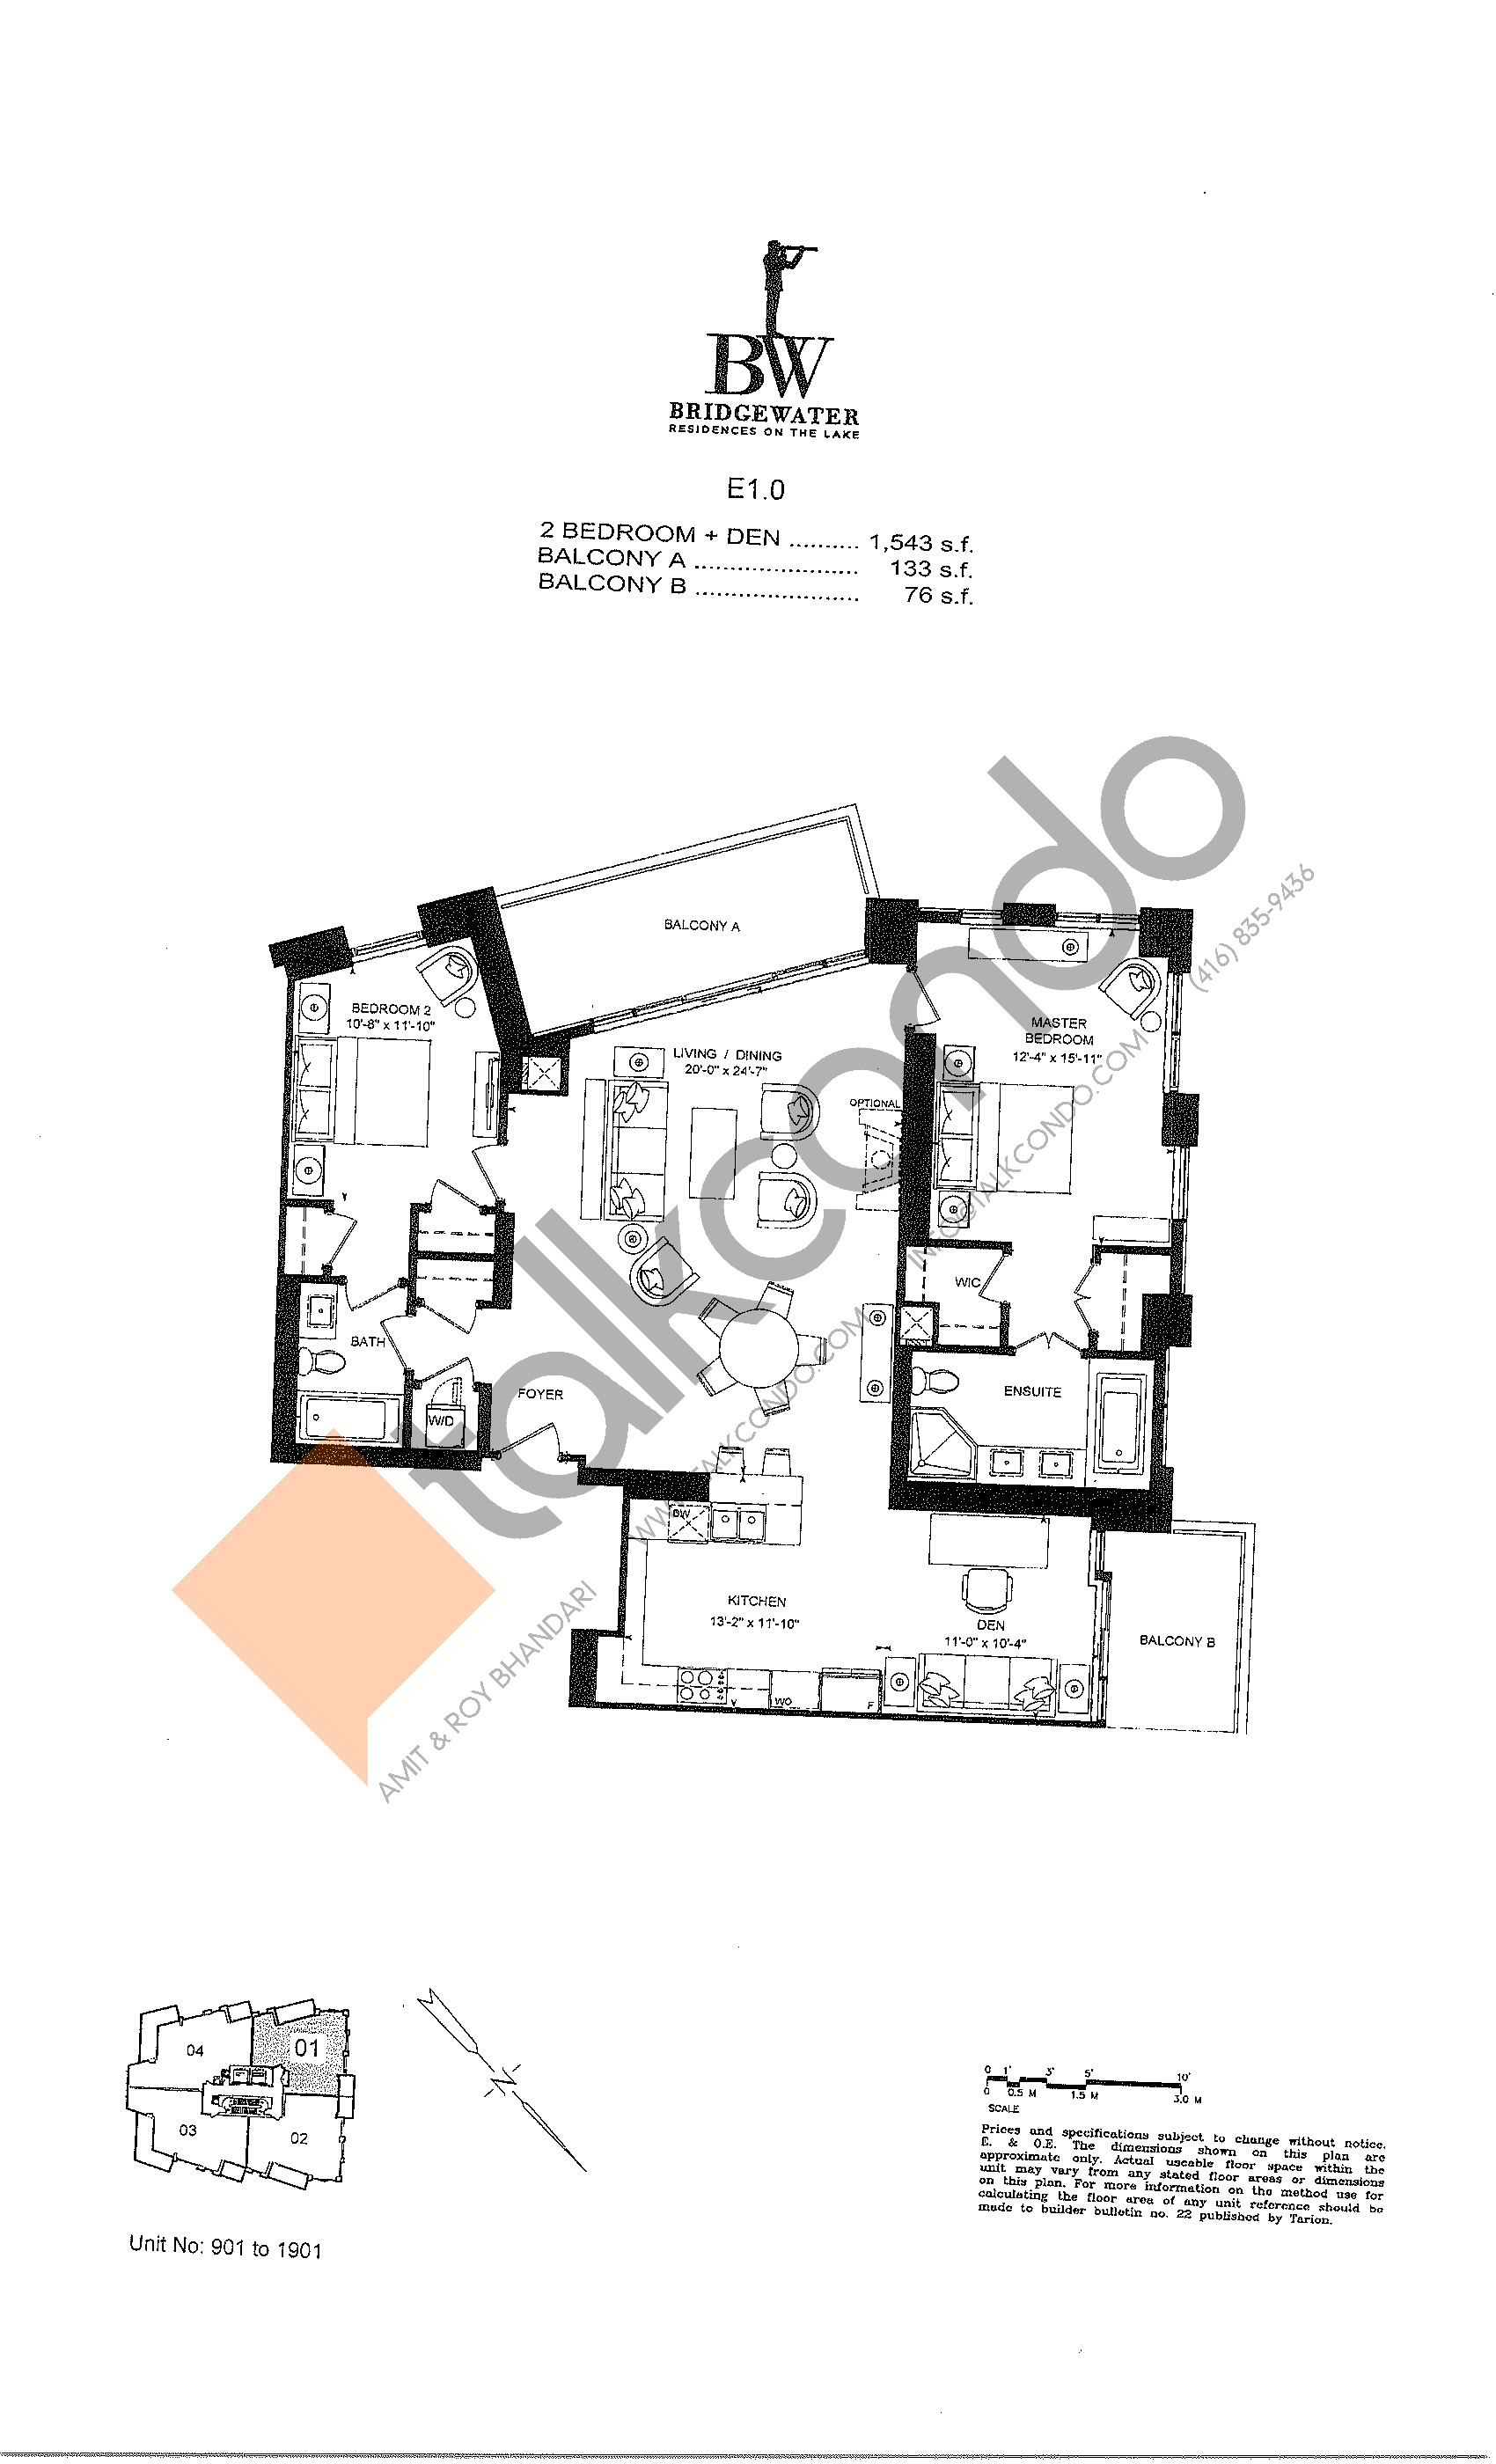 Bridgewater Residences On The Lake Condos Floor Plans Prices Availability Talkcondo